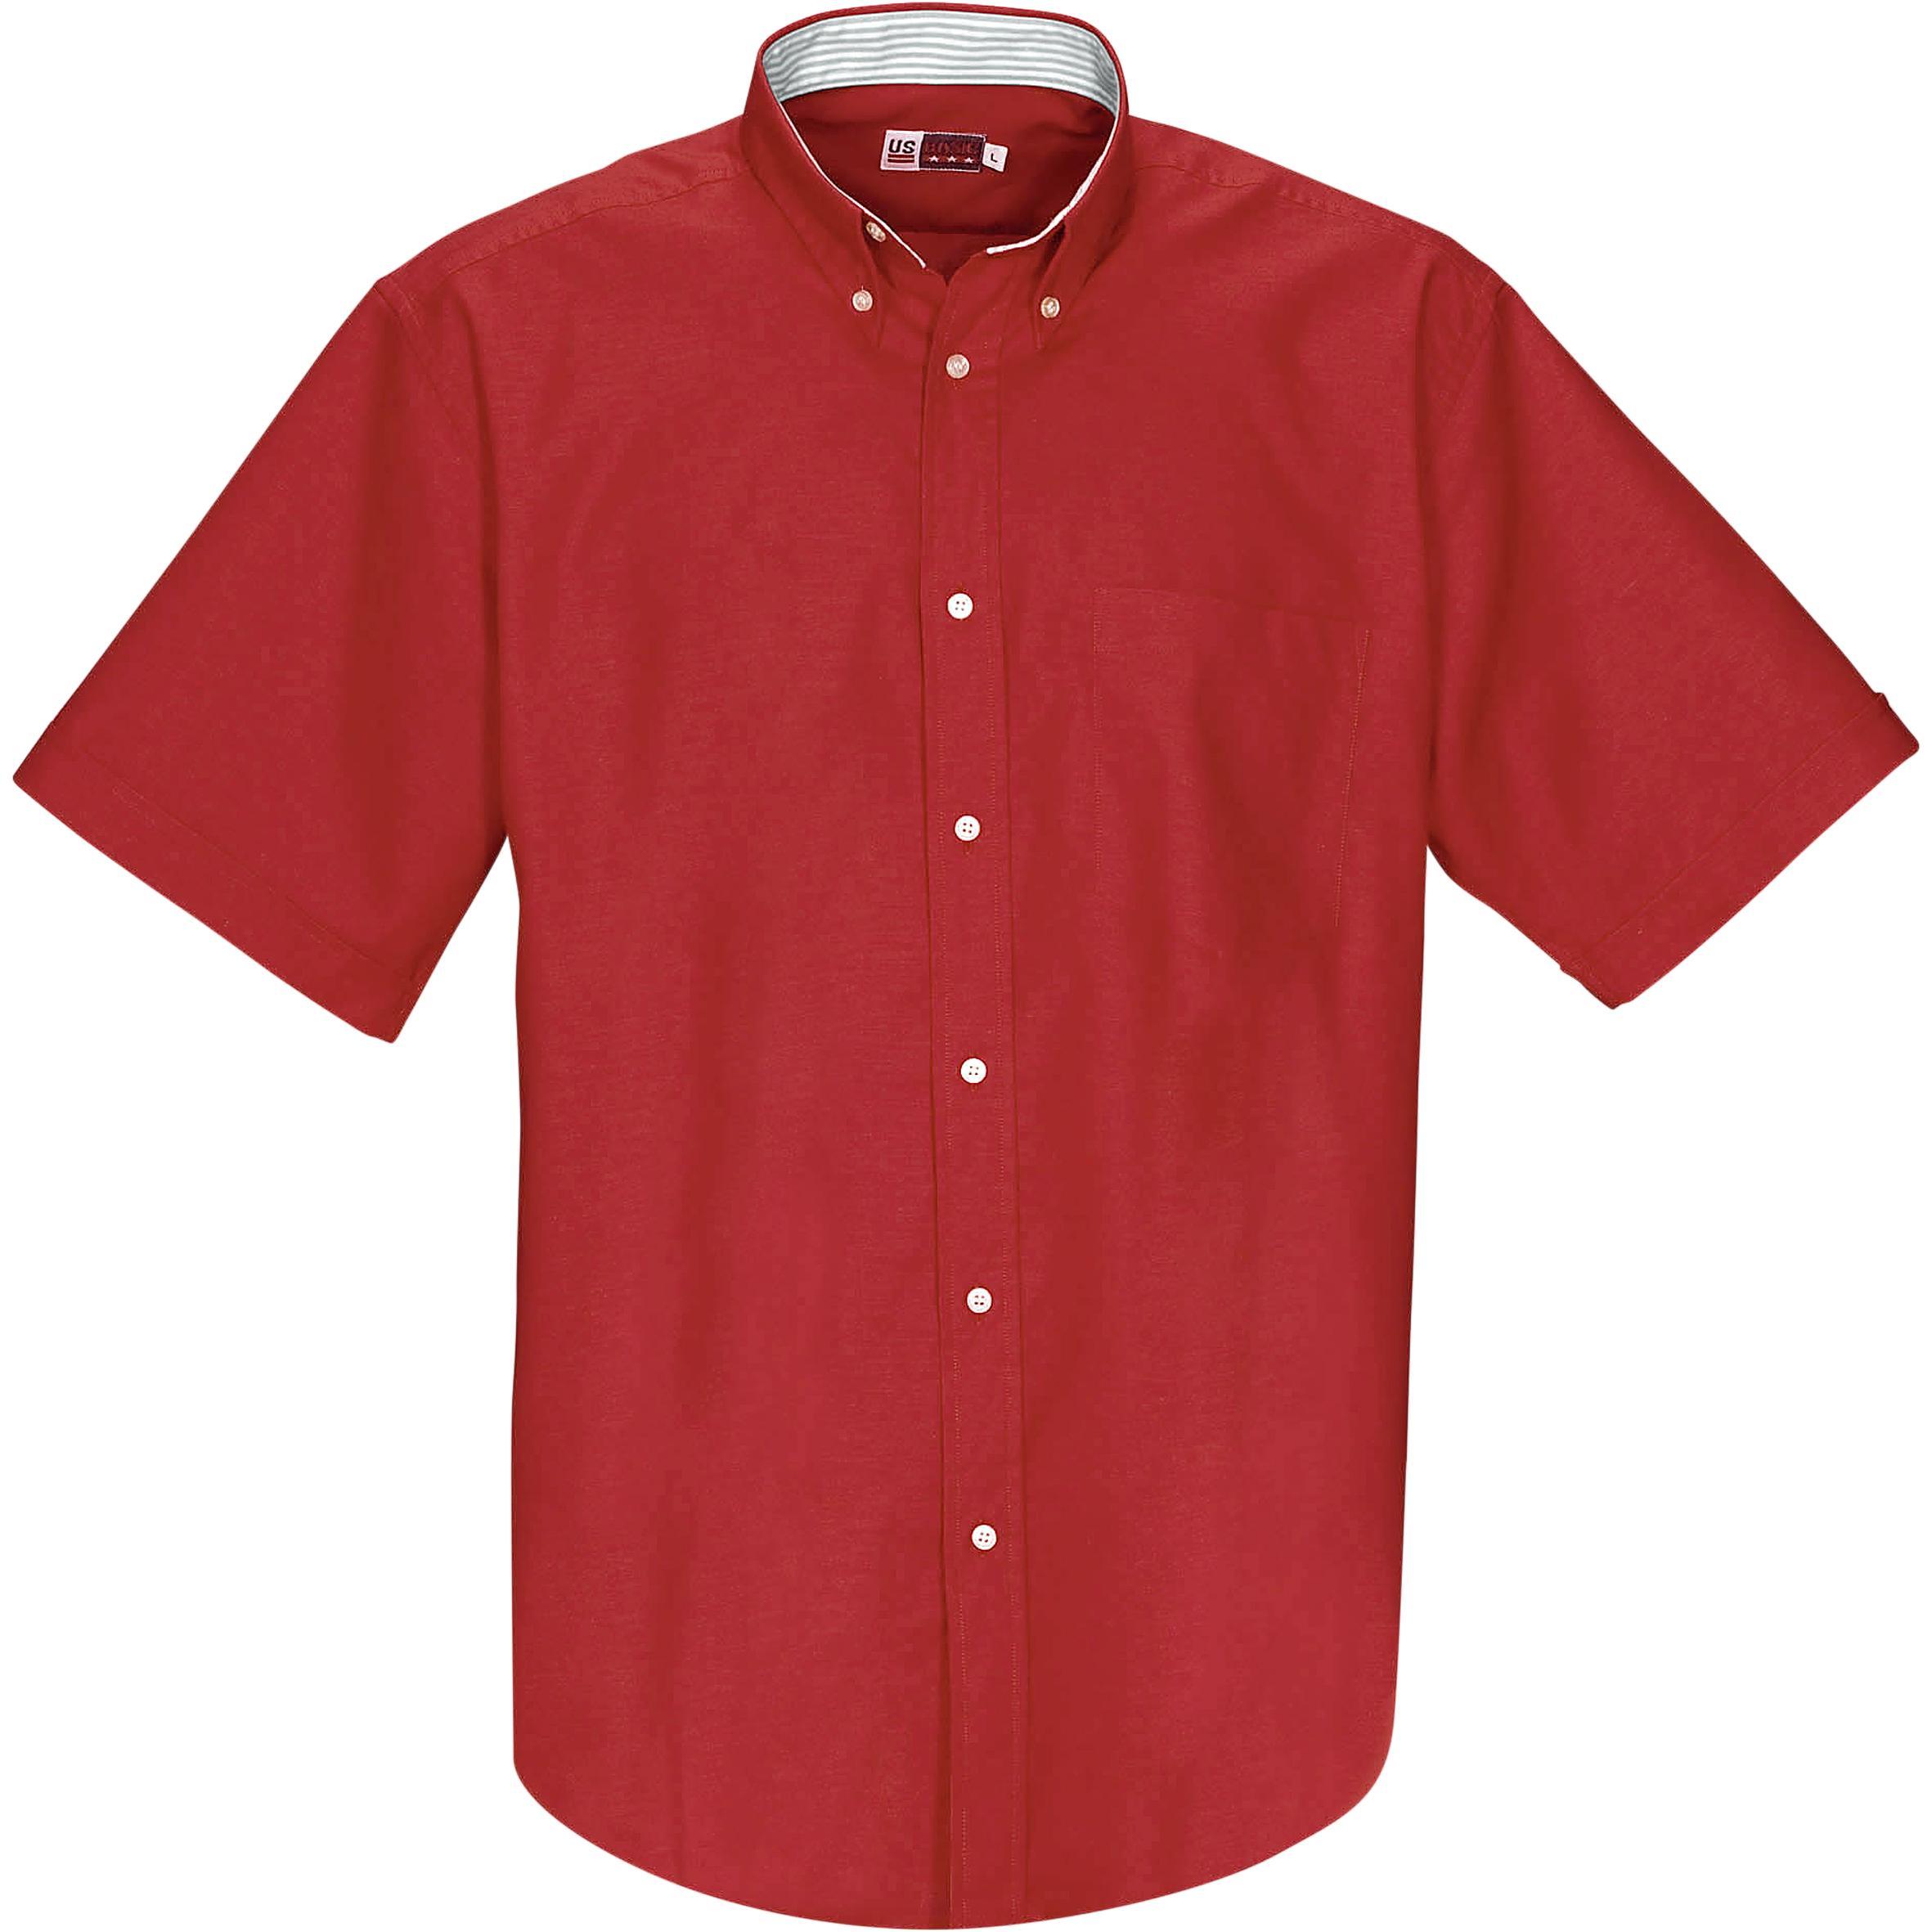 Mens Short Sleeve Aspen Shirt - Red Only